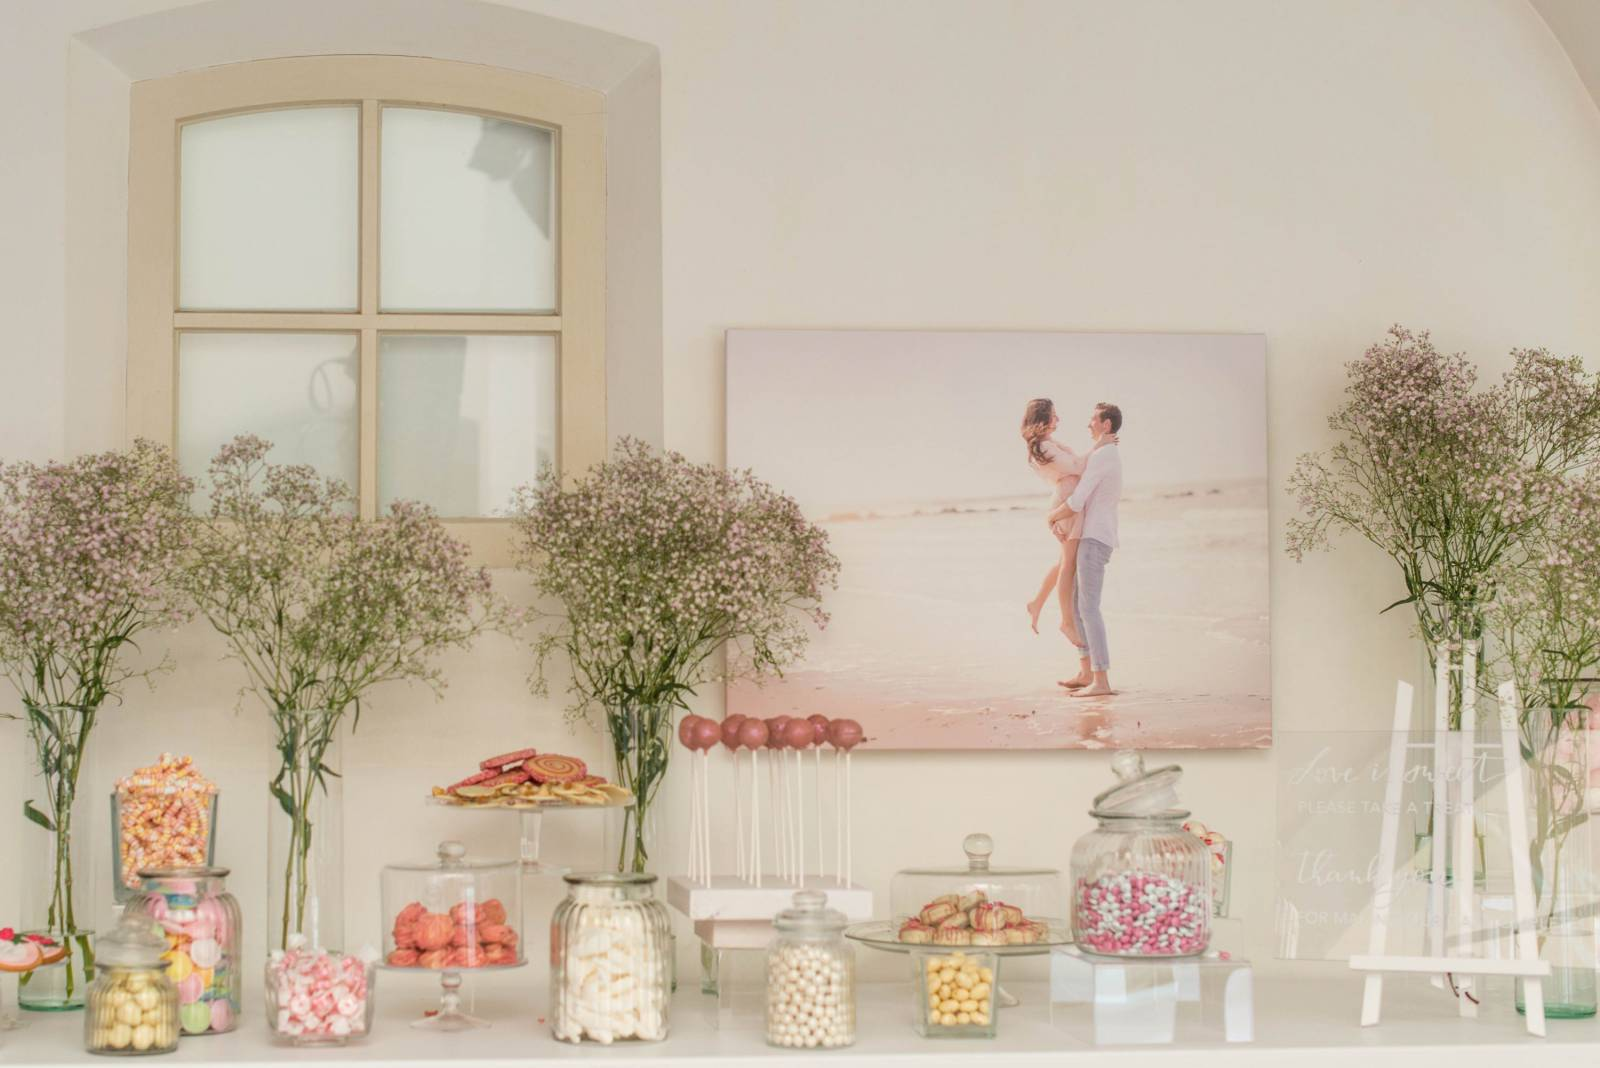 Feriatus - Wedding Planner - Event Planner - House of Weddings - 13